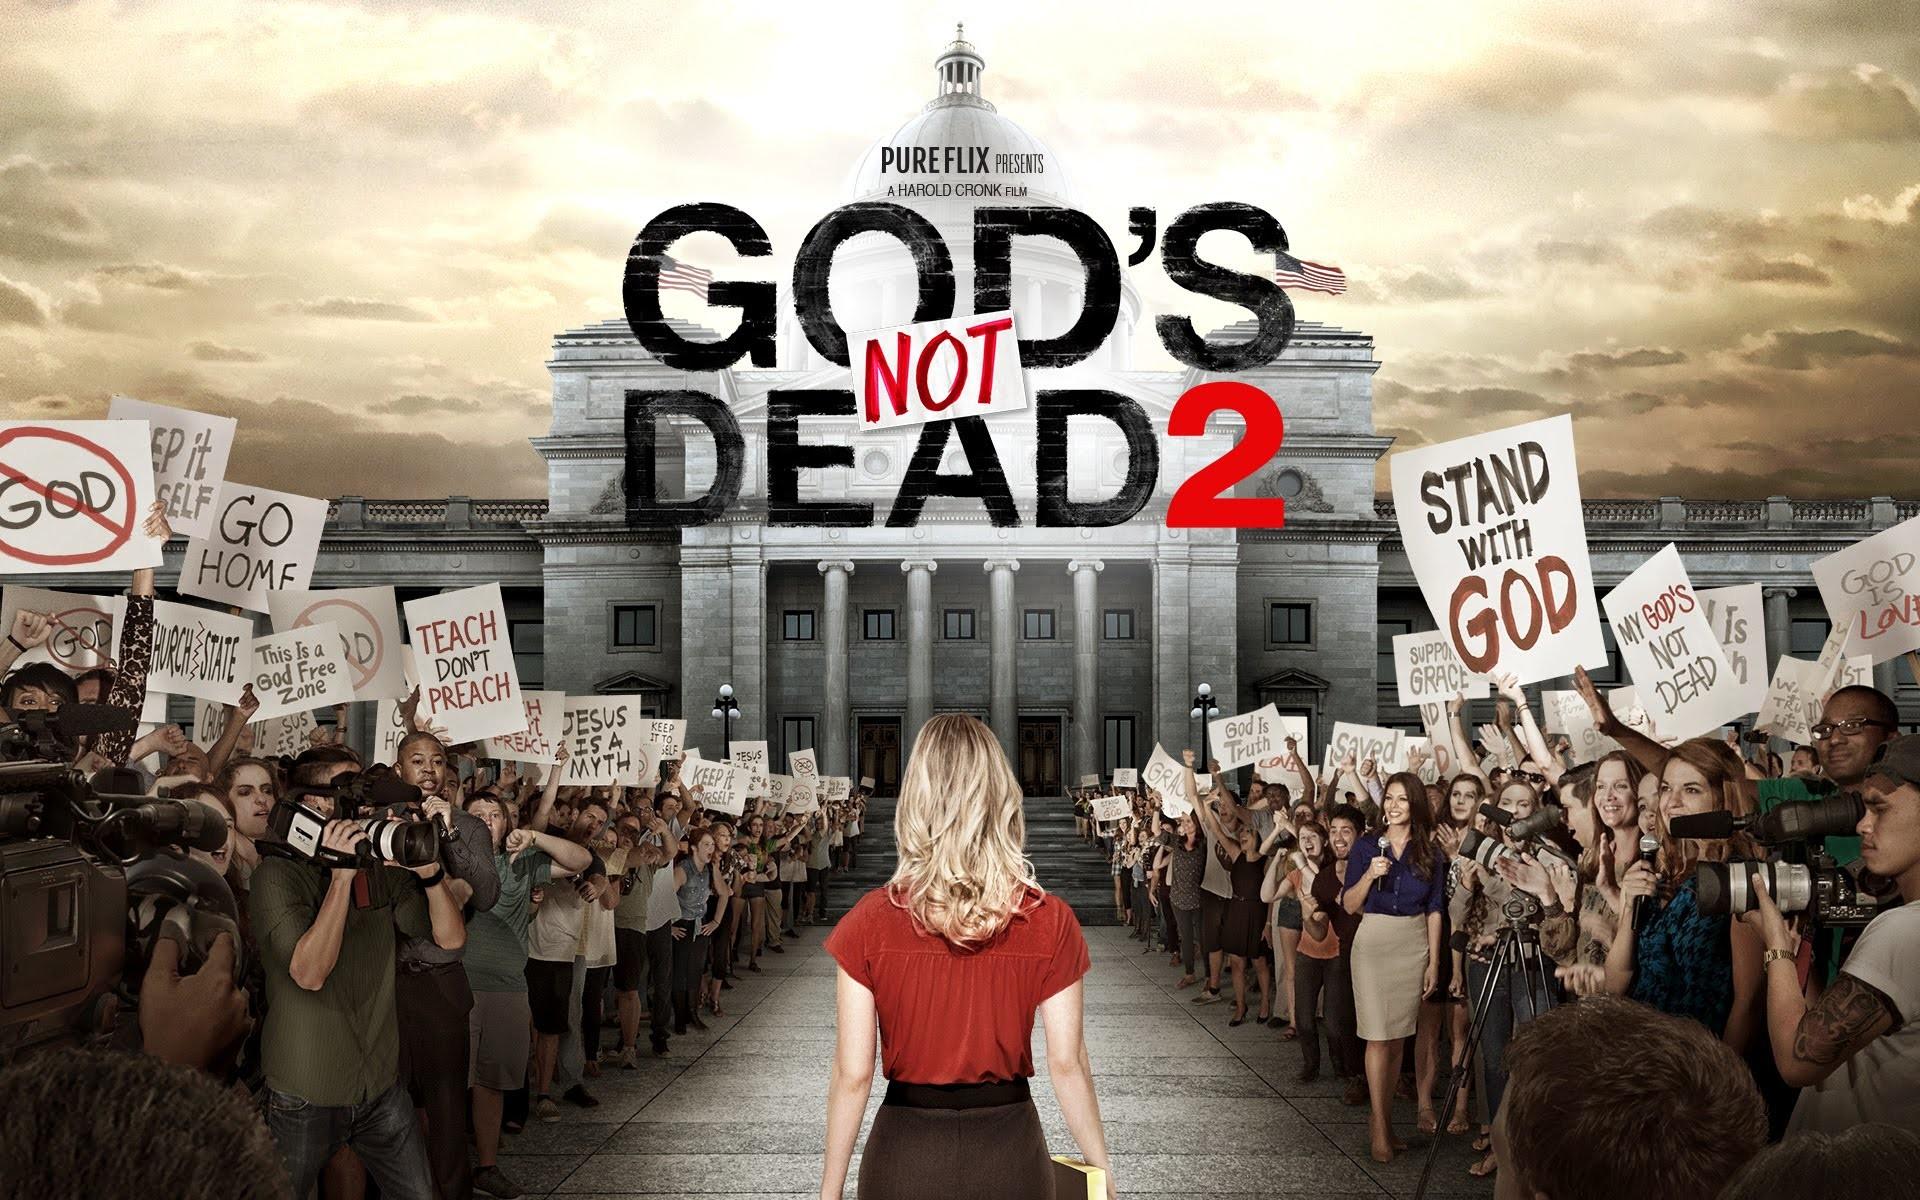 God's Not Dead 2 | Trailer | Now Playing | godsnotdeadthemovie.com – YouTube